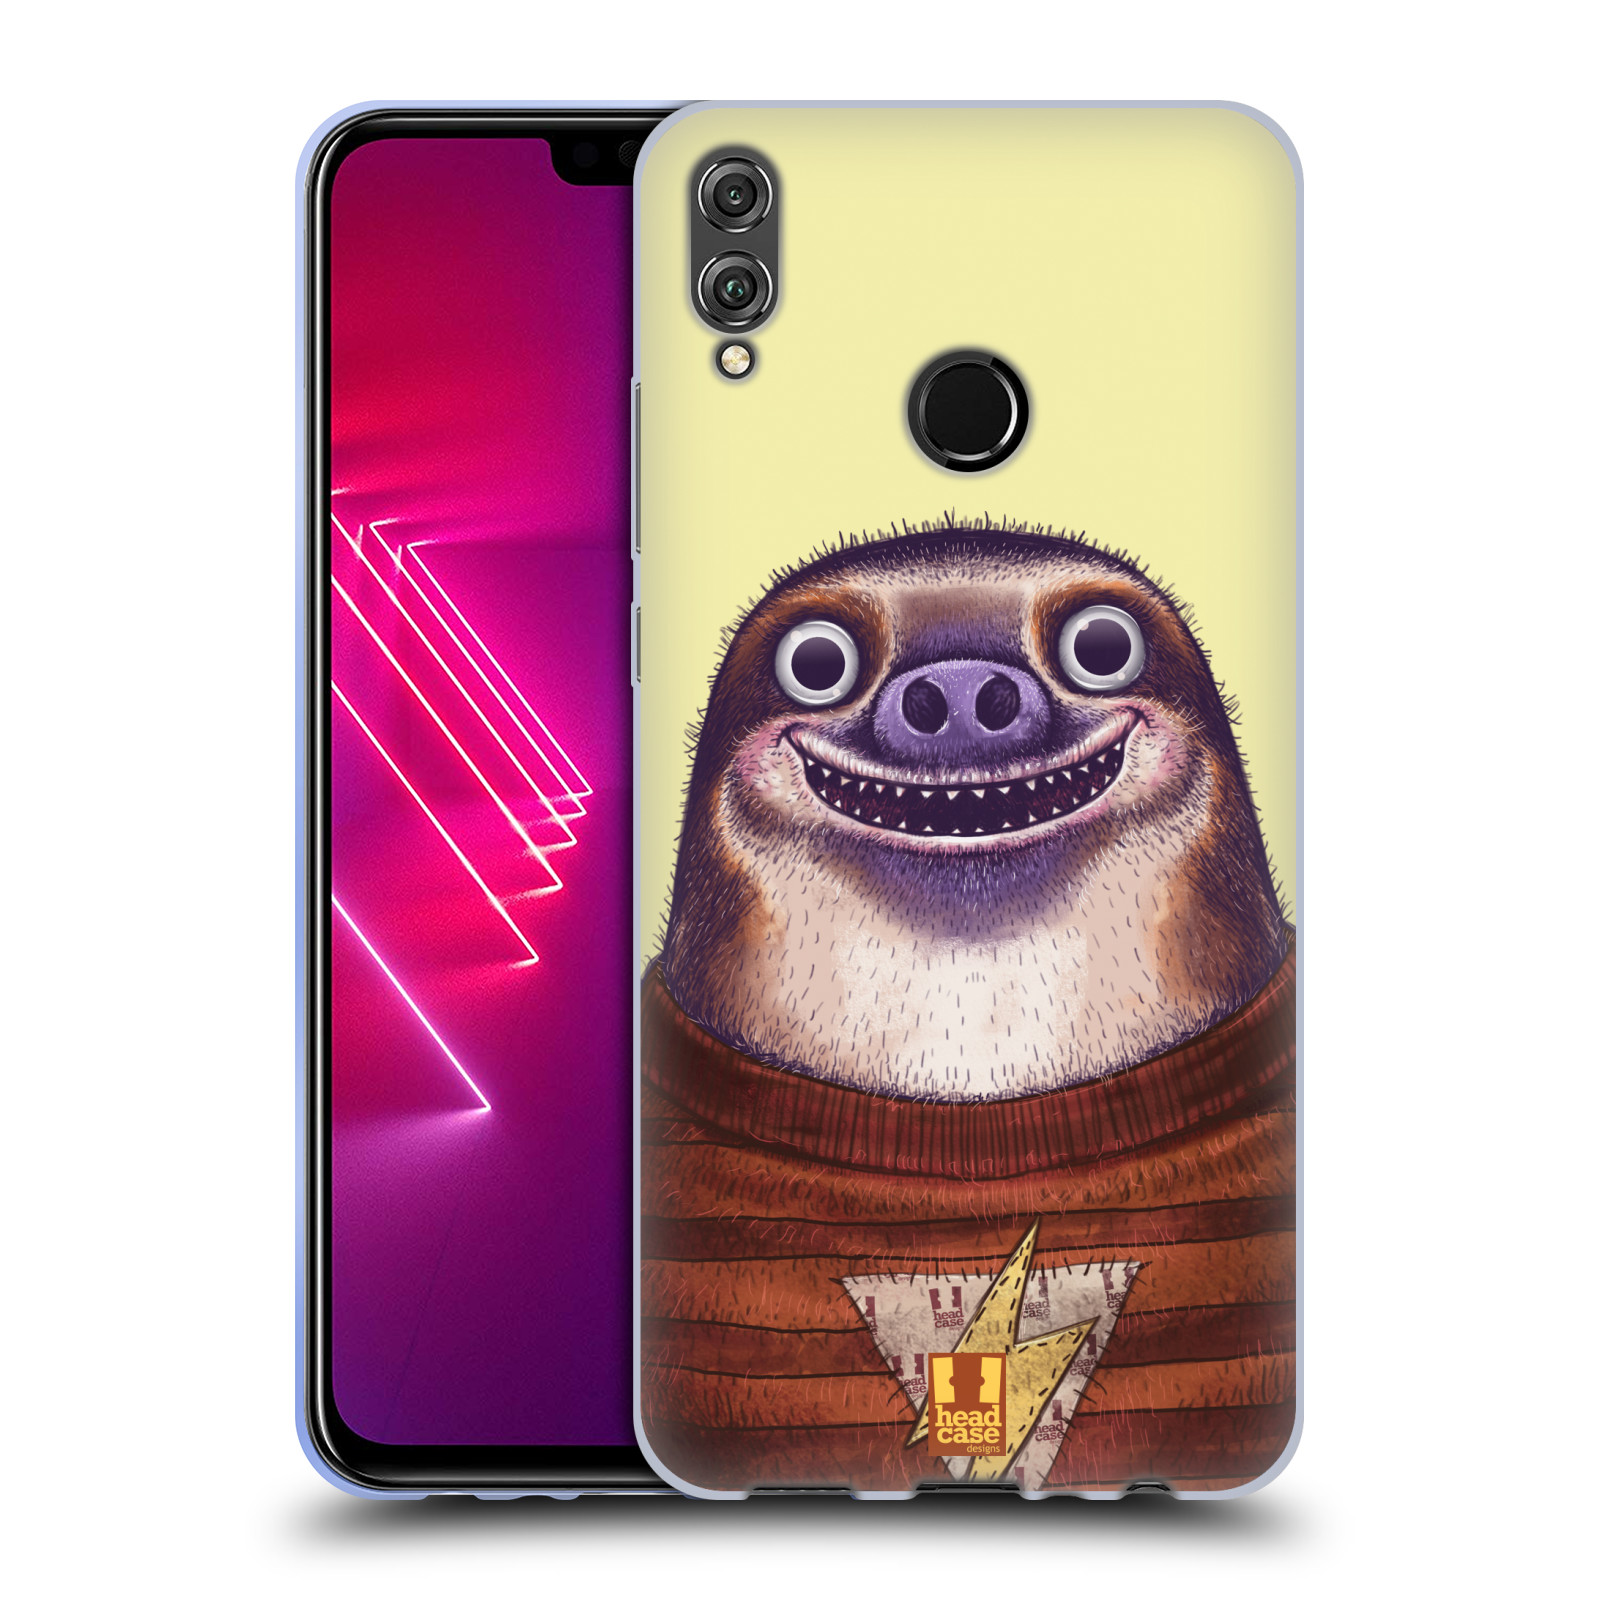 Silikonové pouzdro na mobil Honor View 10 Lite - Head Case - ANIMPLA LENOCHOD